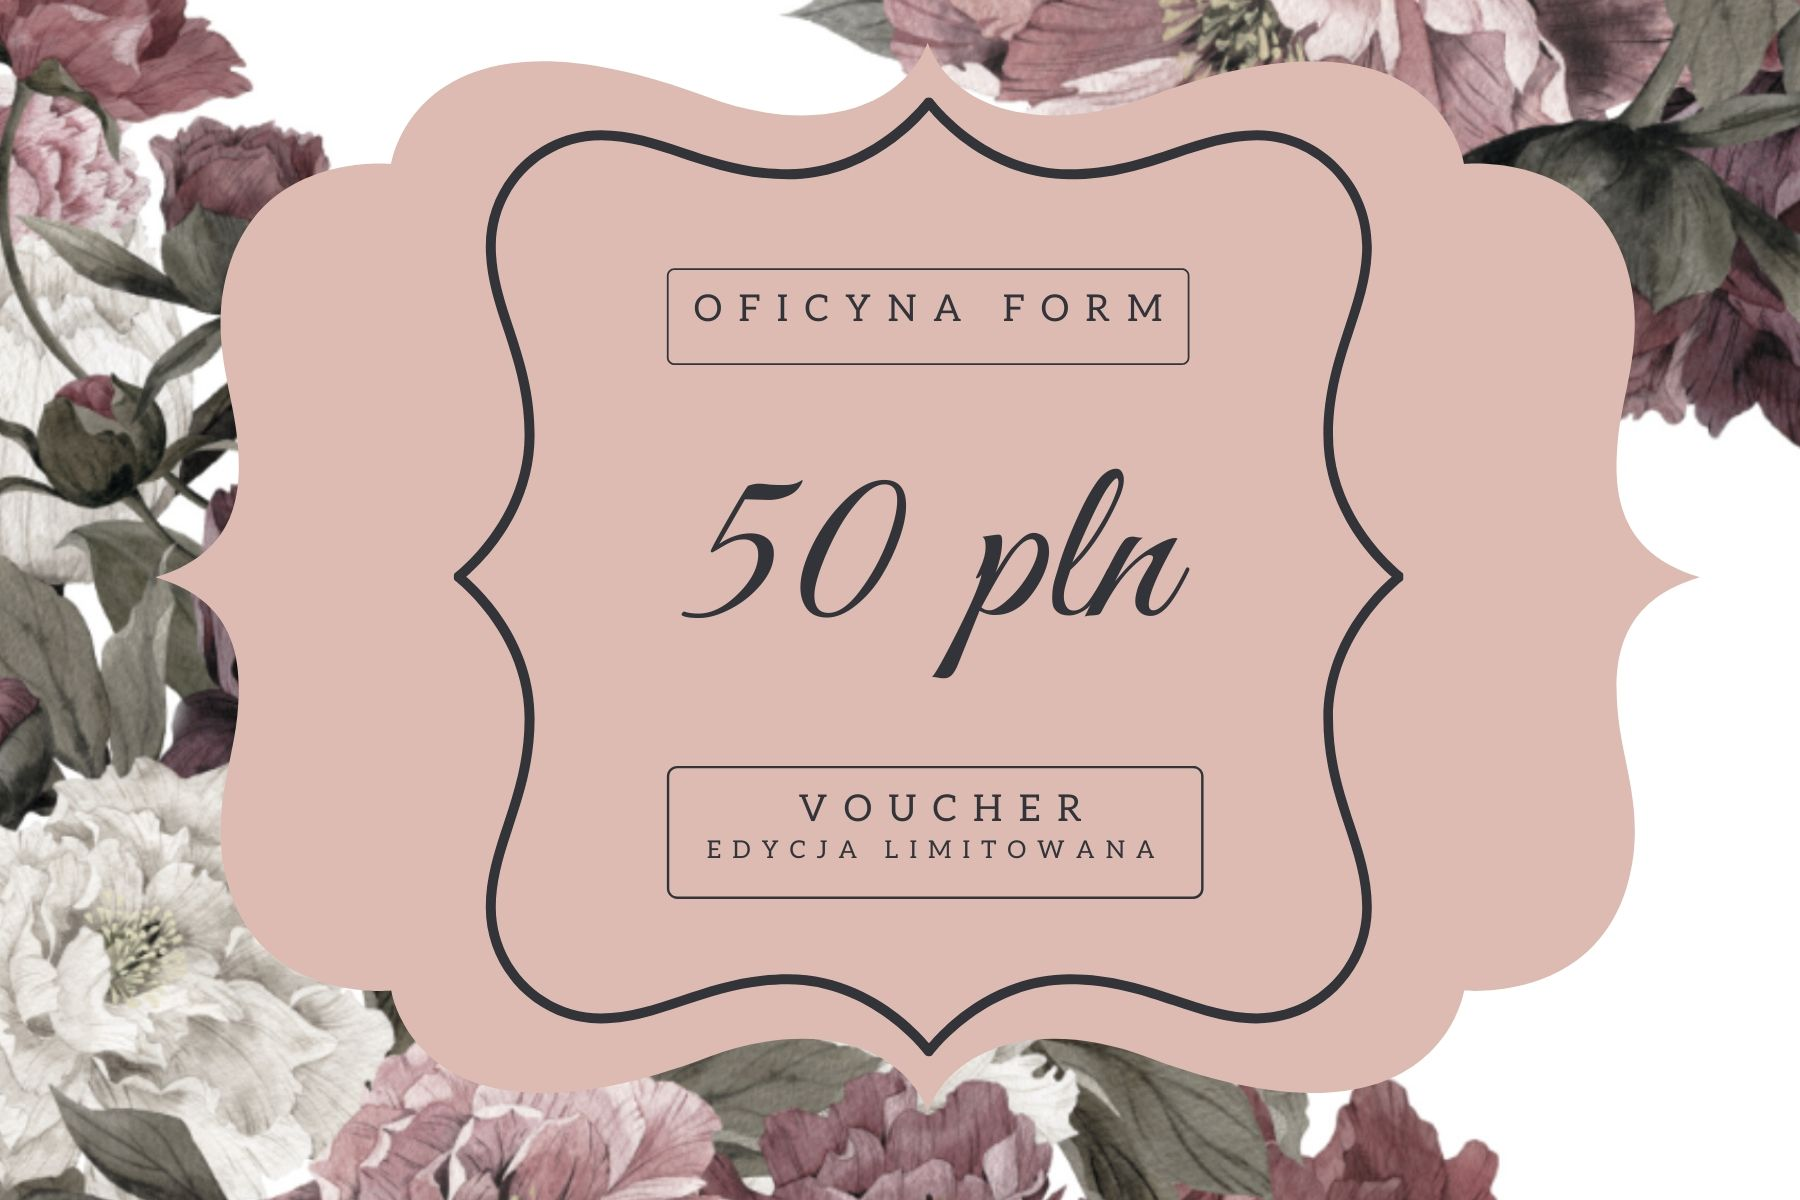 Oficyna Form Voucher 50 pln